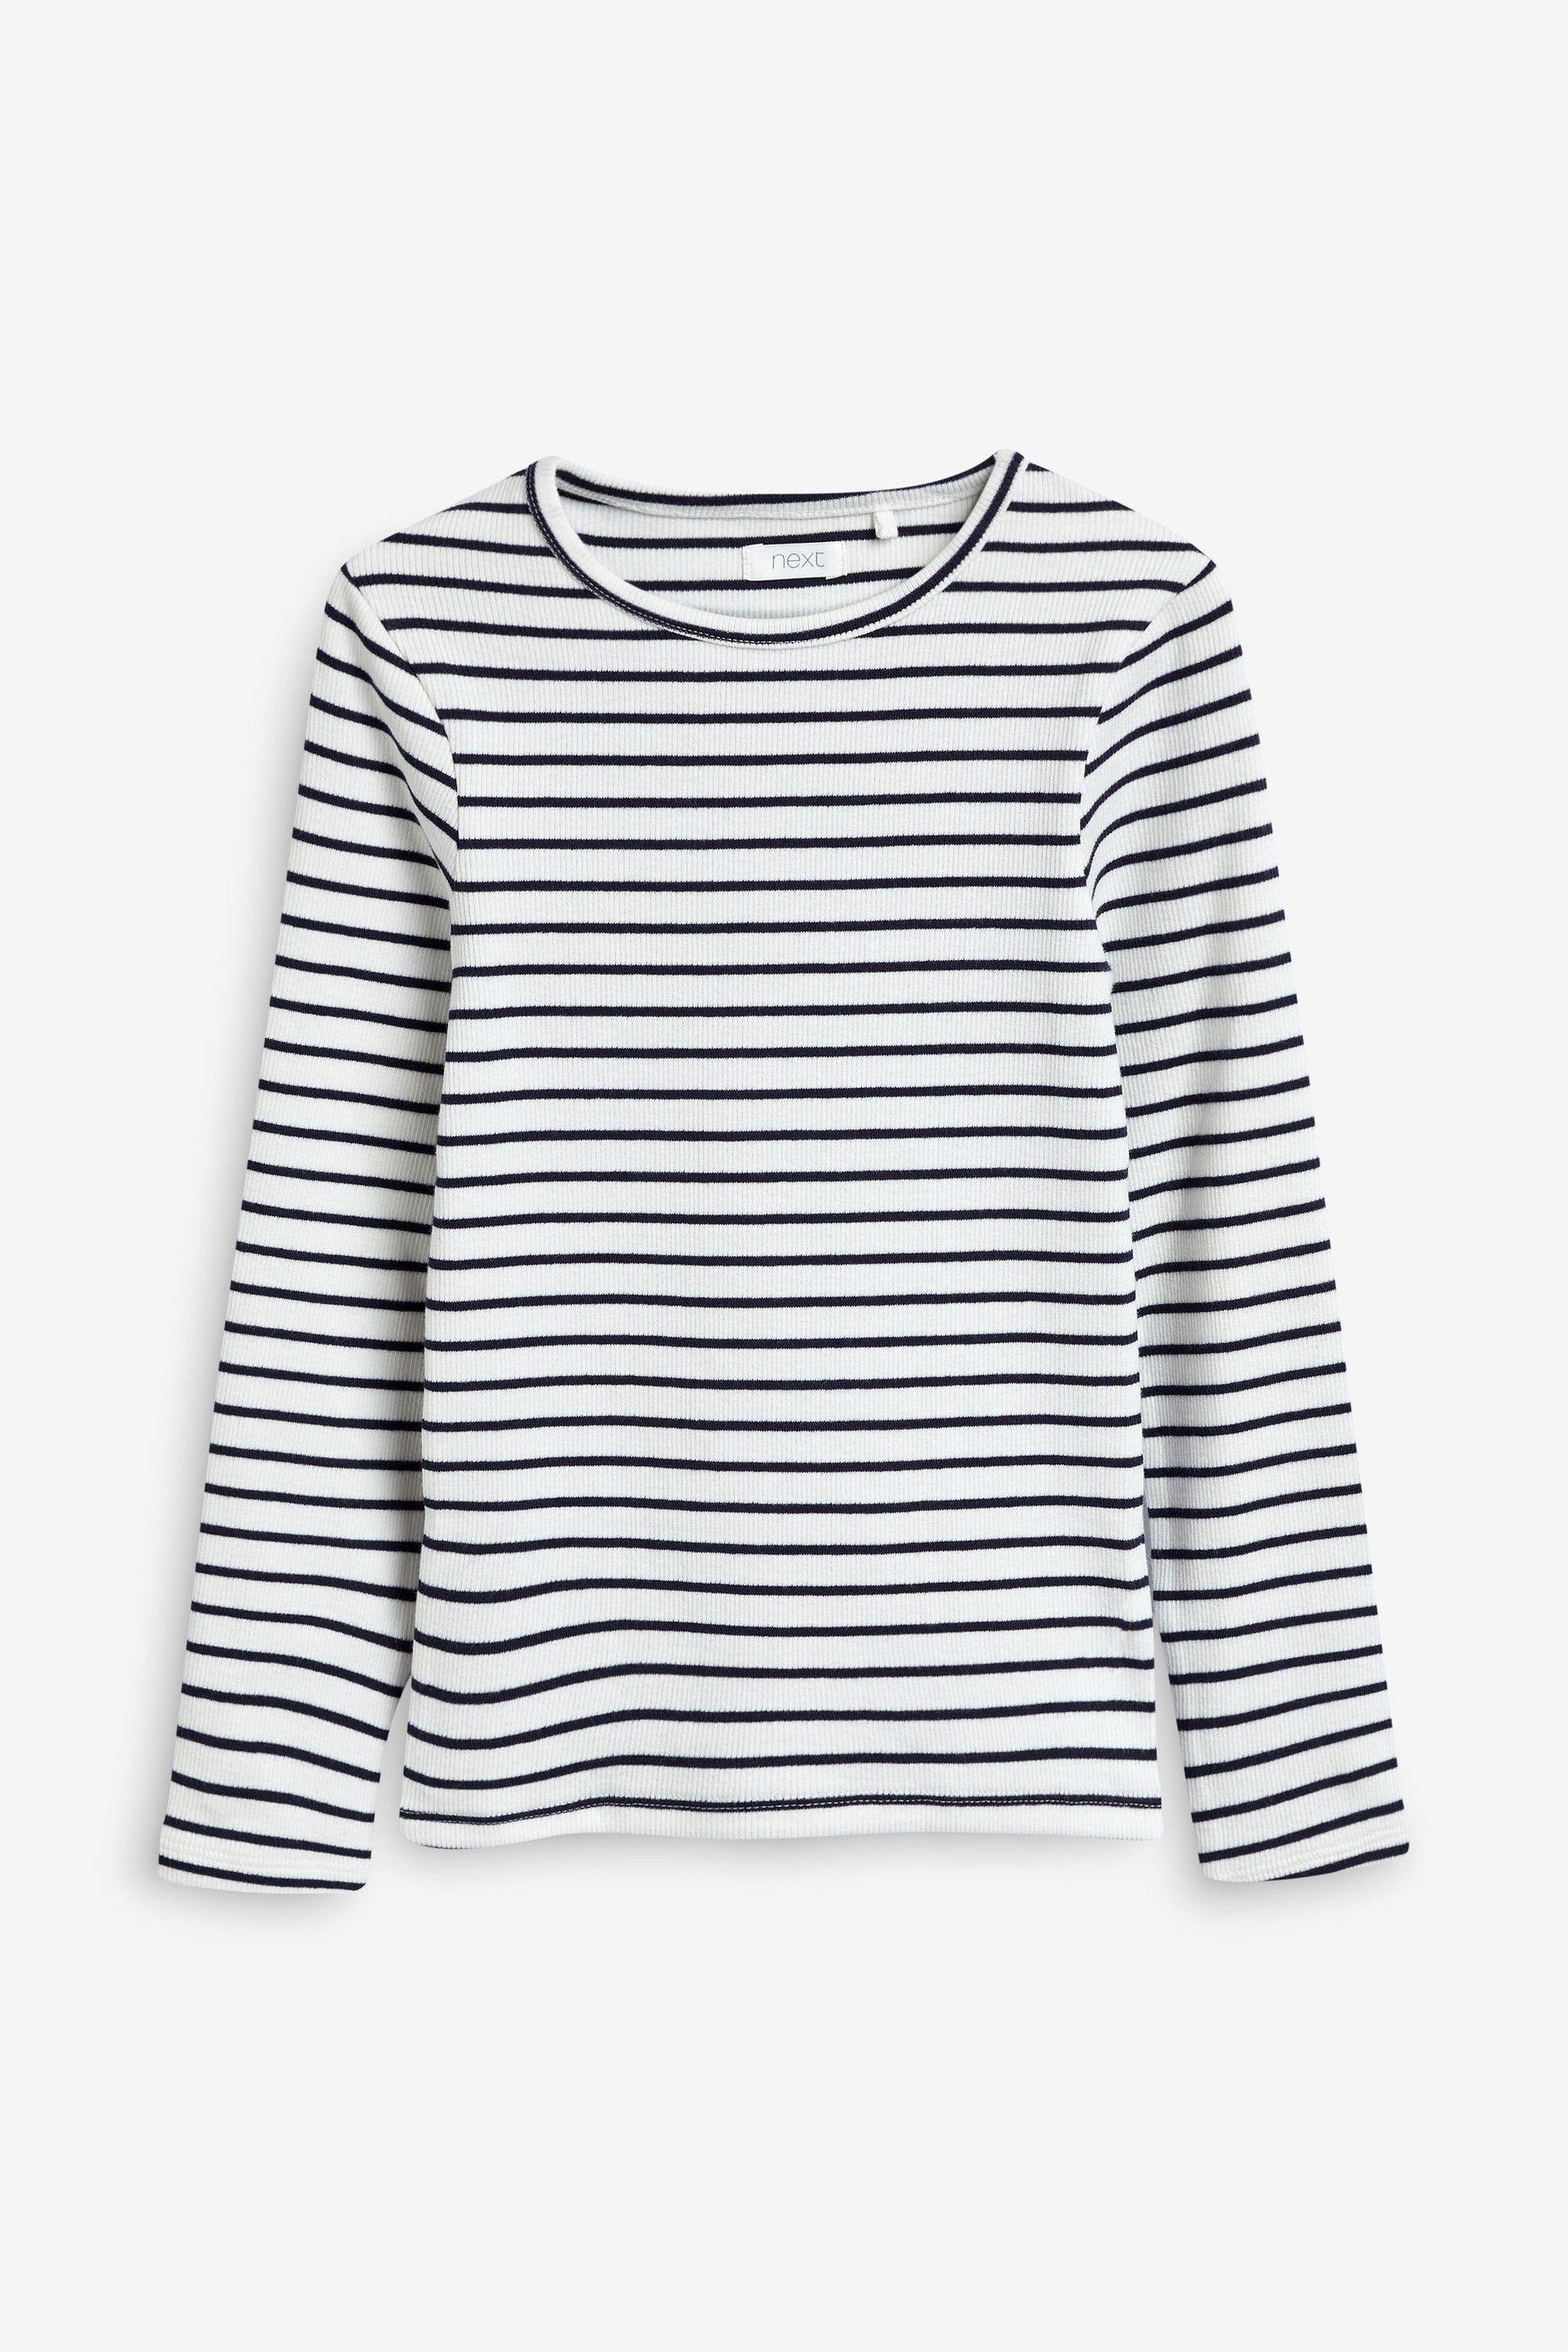 NEXT Ladies Black or Navy White Stripe Long Sleeve T Shirt Top